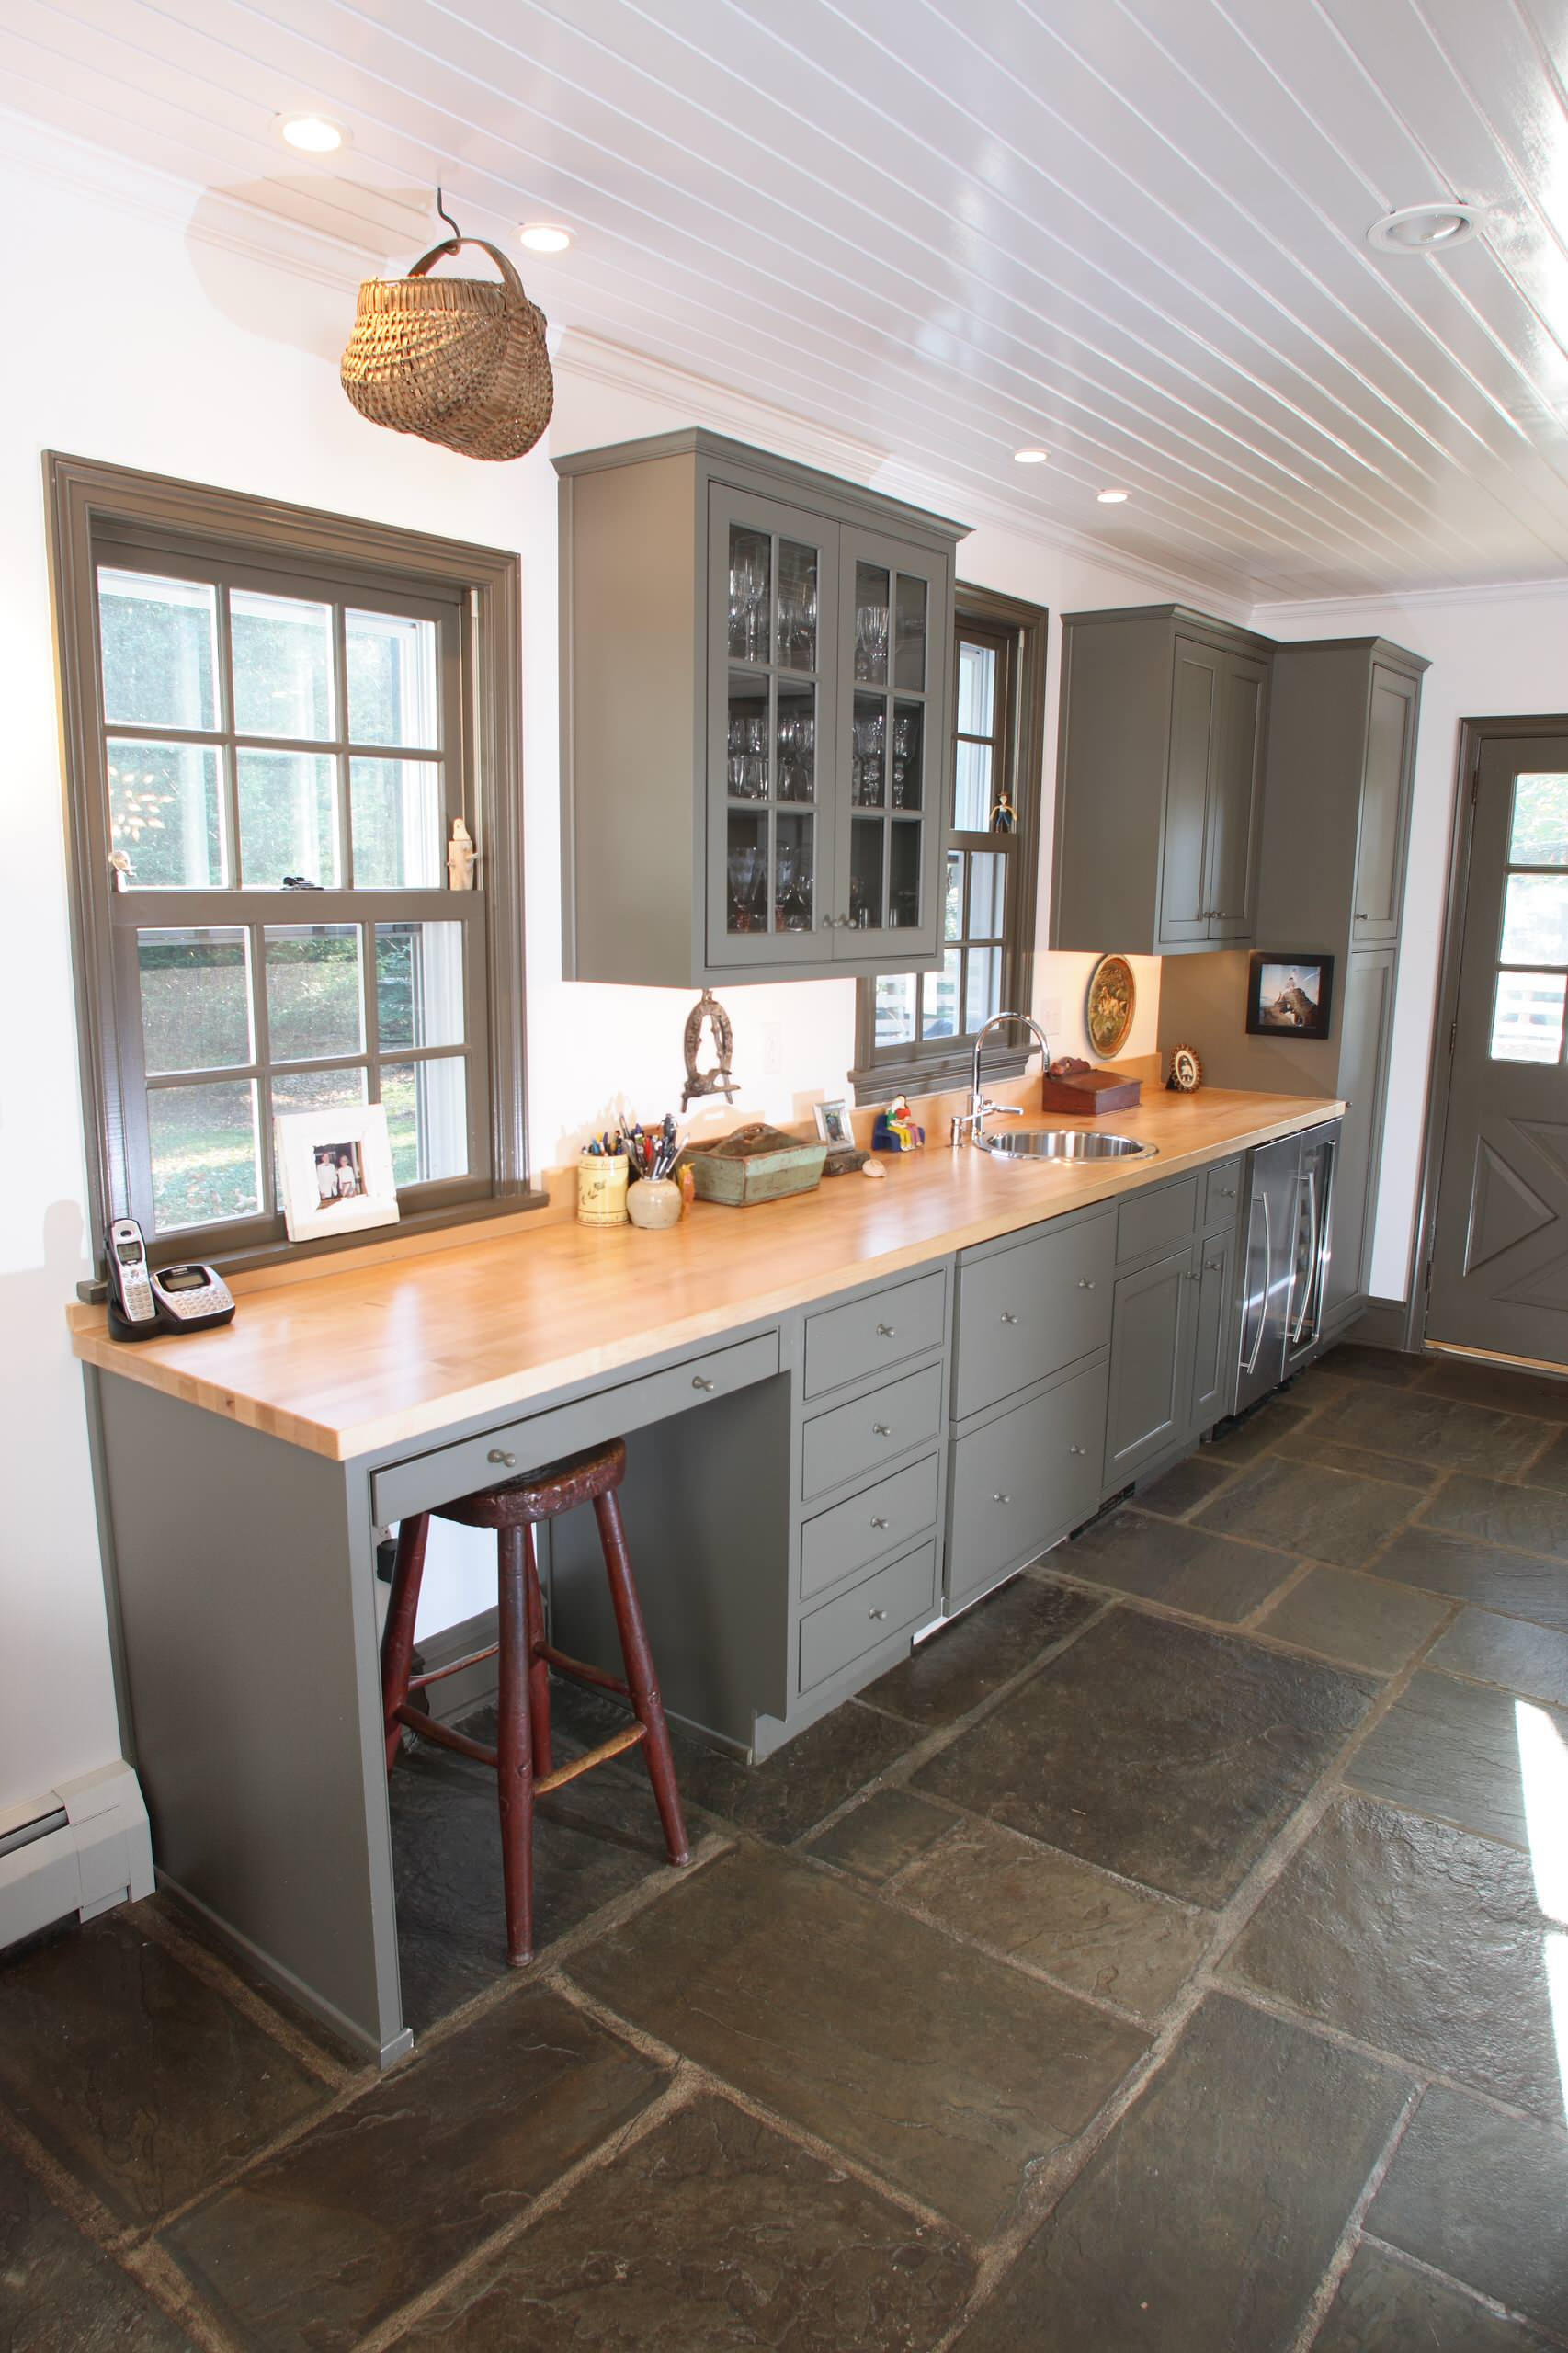 75 Beautiful Farmhouse Slate Floor Kitchen Pictures & Ideas - January, 2021 | Houzz